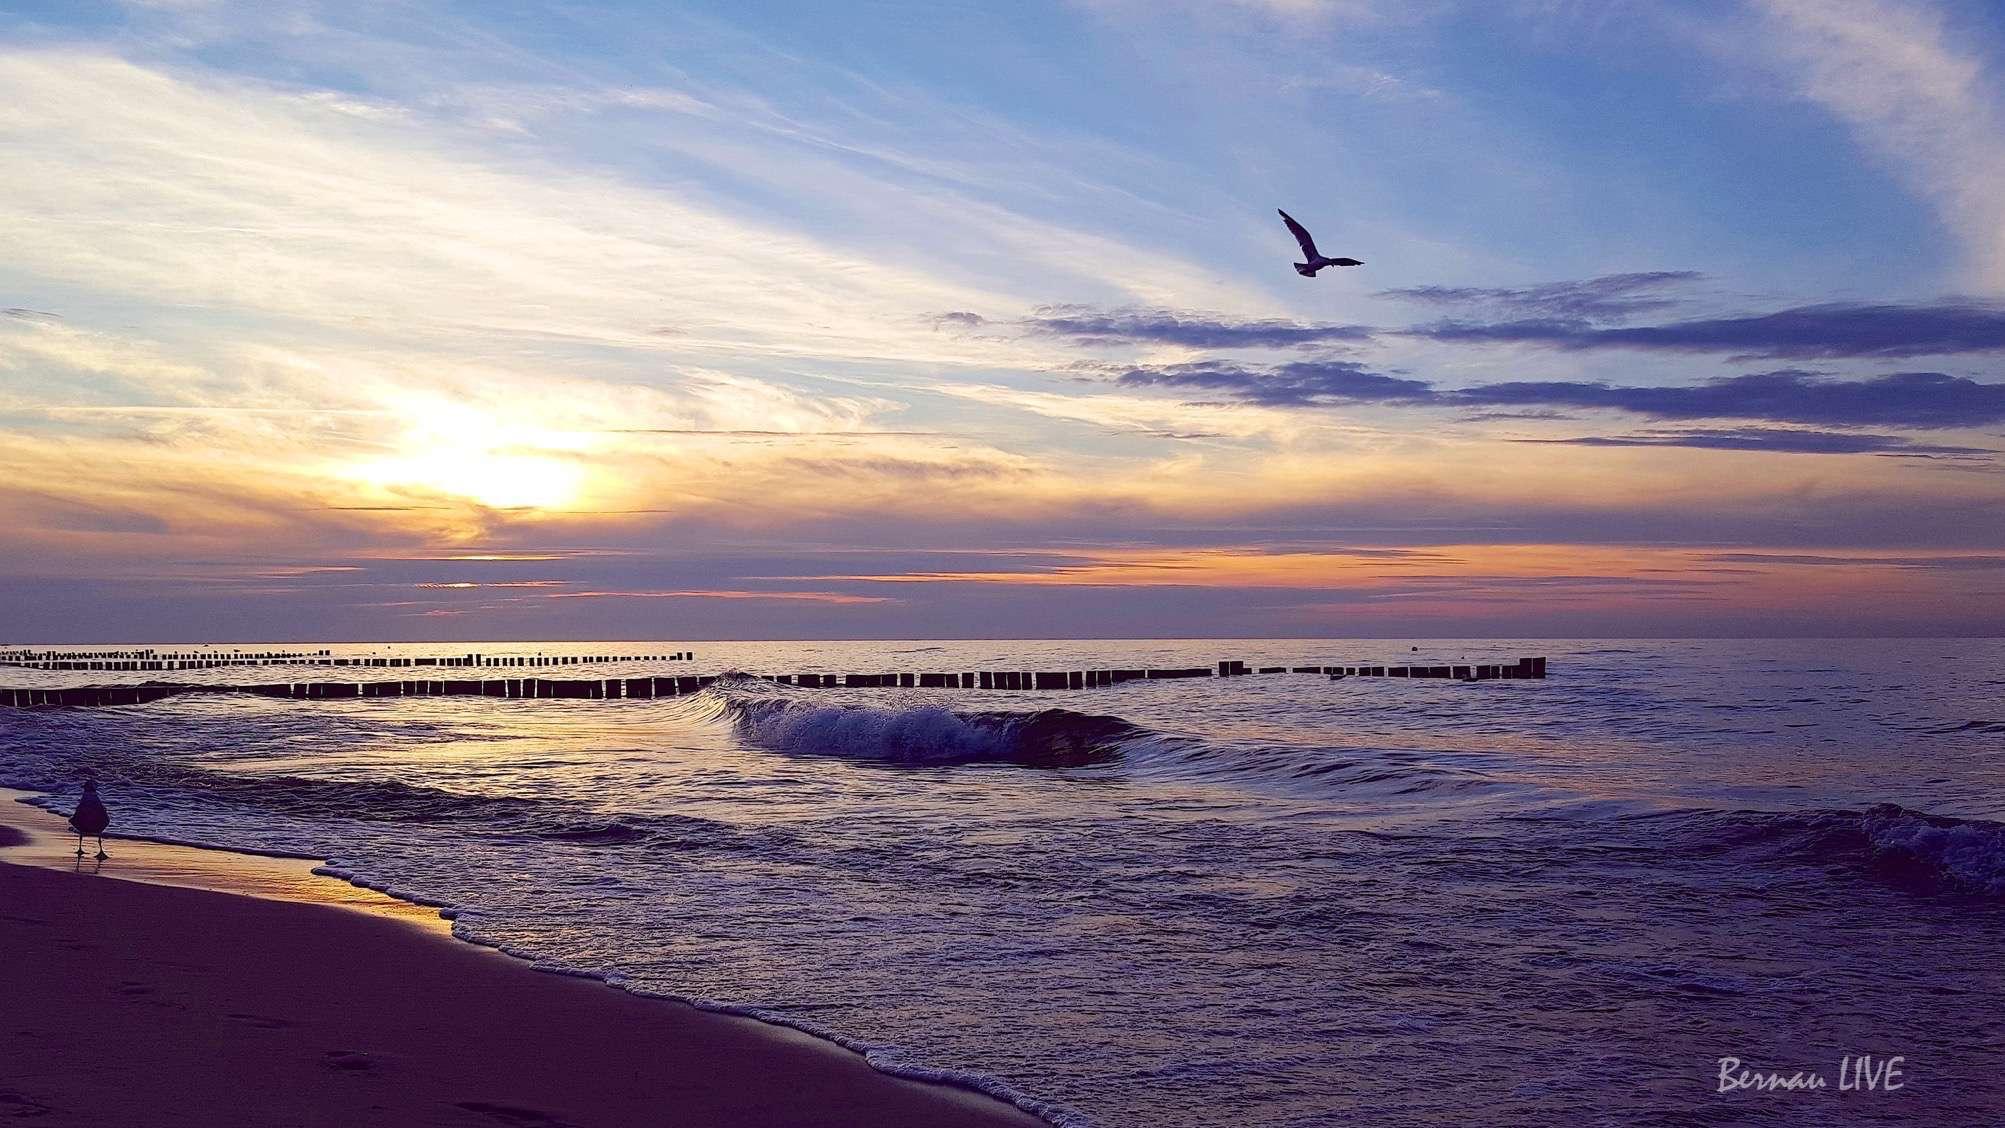 Ostsee, Kühlungsborn, Bernau LIVE, Natur, Sommer, Abend, Sonnenuntergang, Bernau LIVE, Meer, Wasser